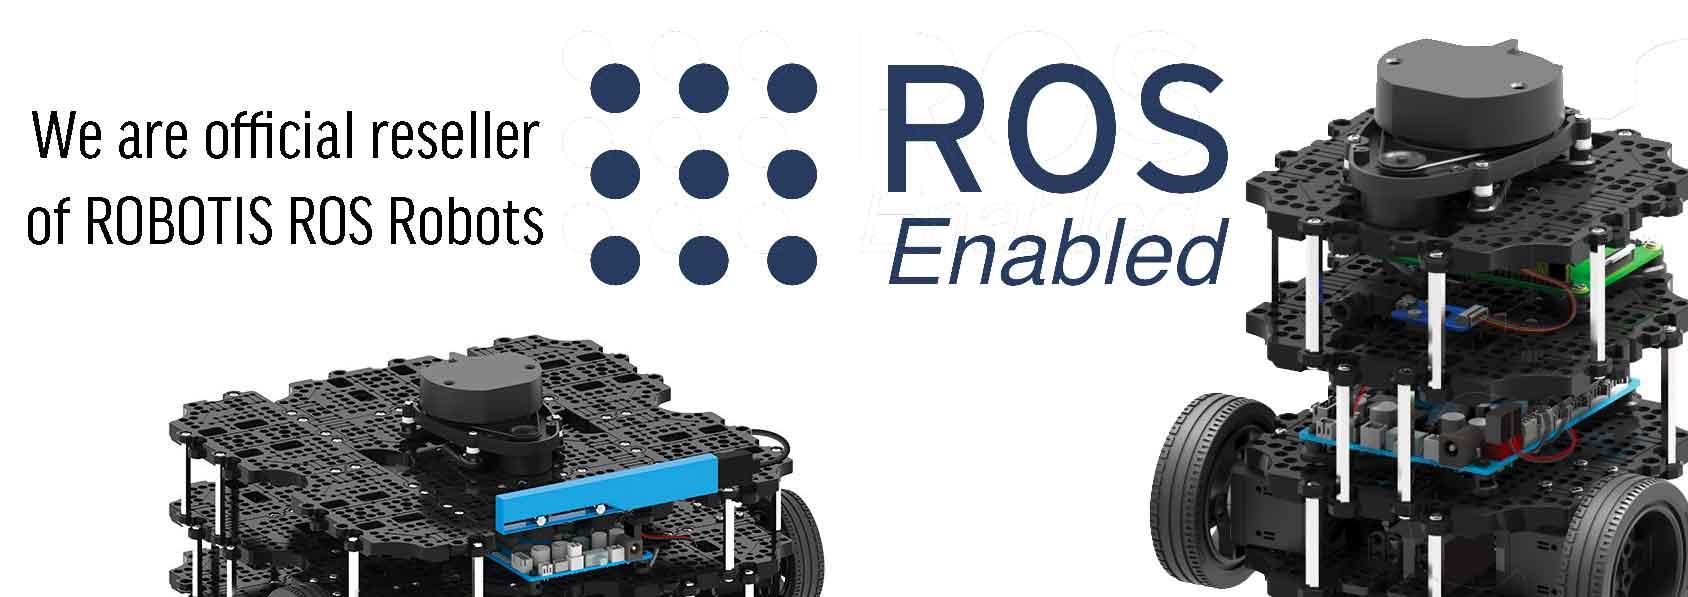 Turtlebot ROS Robots